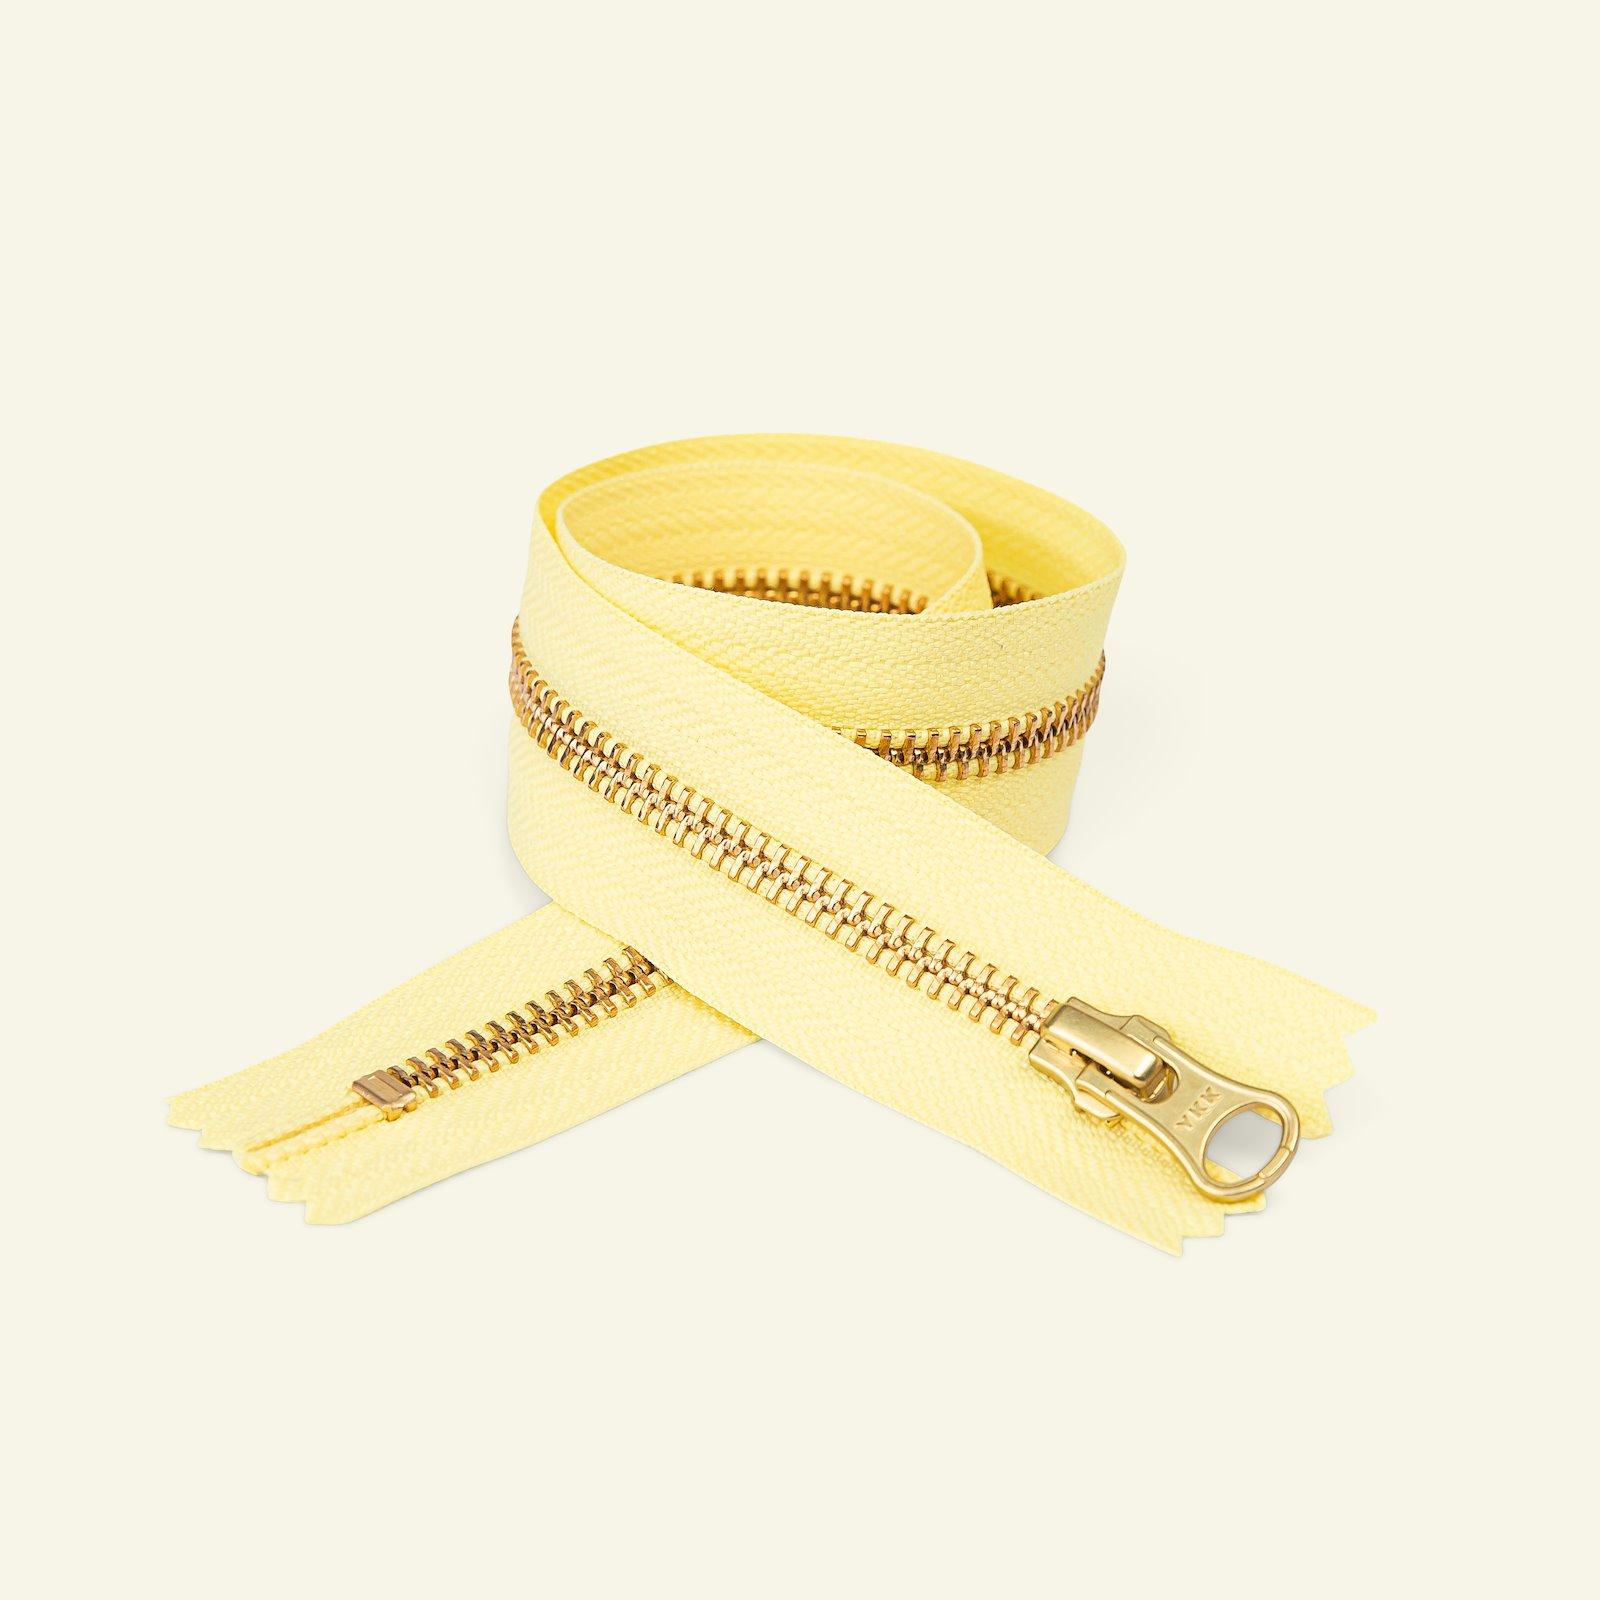 YKK zip 6mm closed end 40cm li. lemon/g. x59344_pack